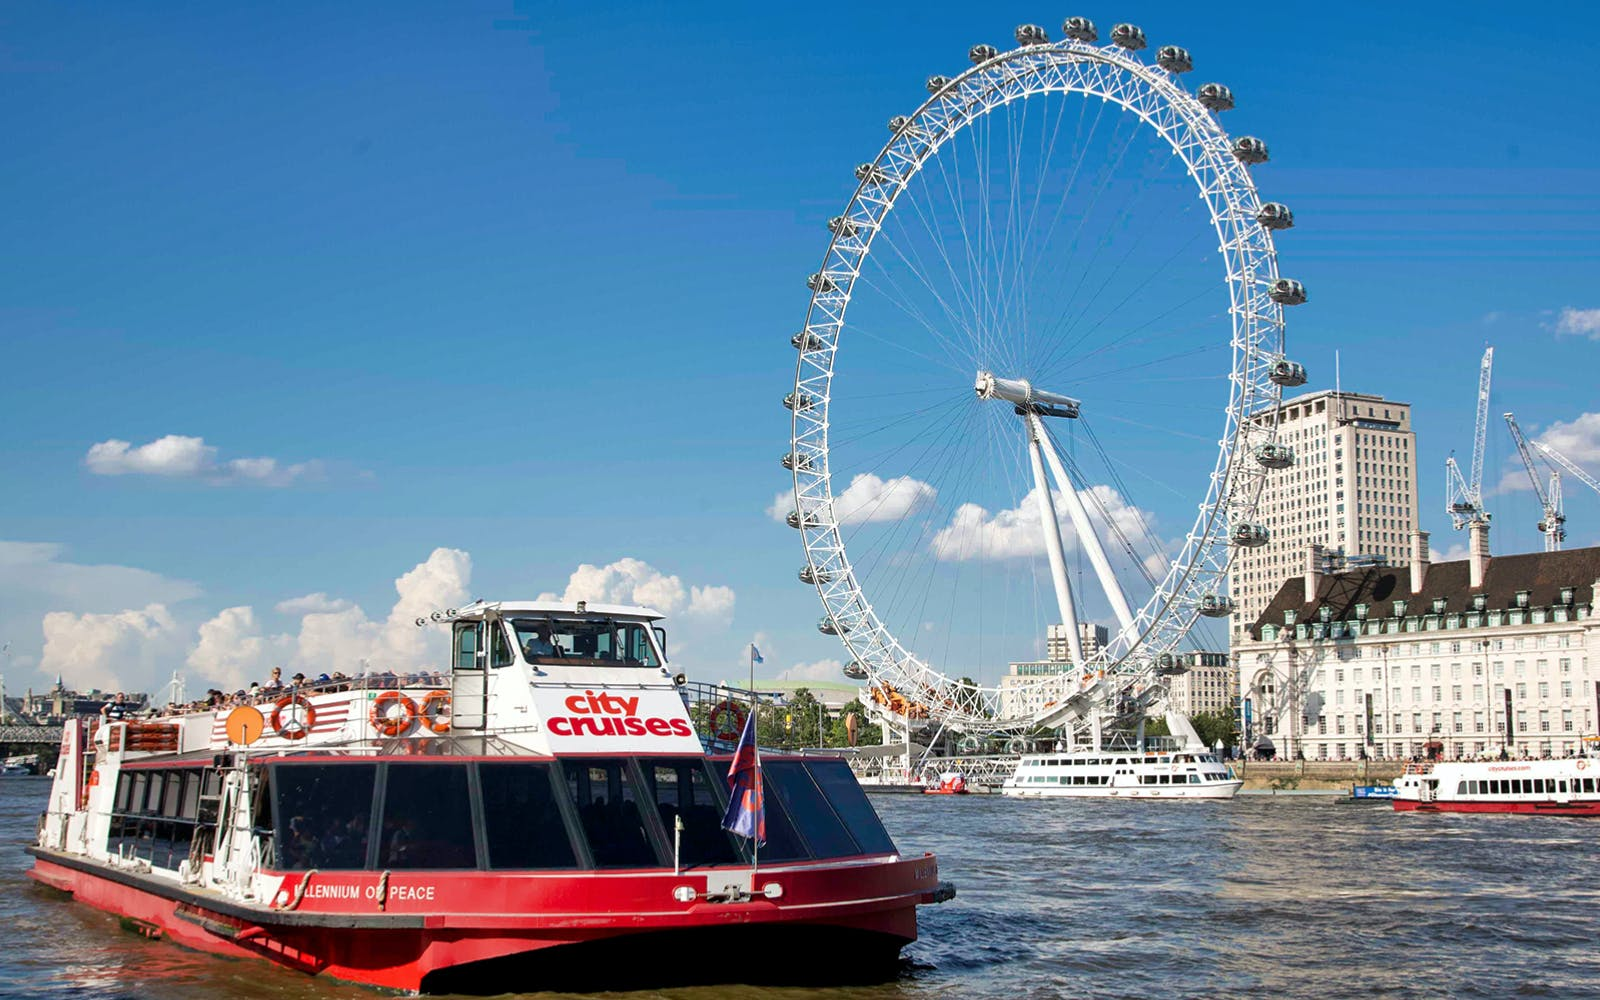 Thames River Cruises London